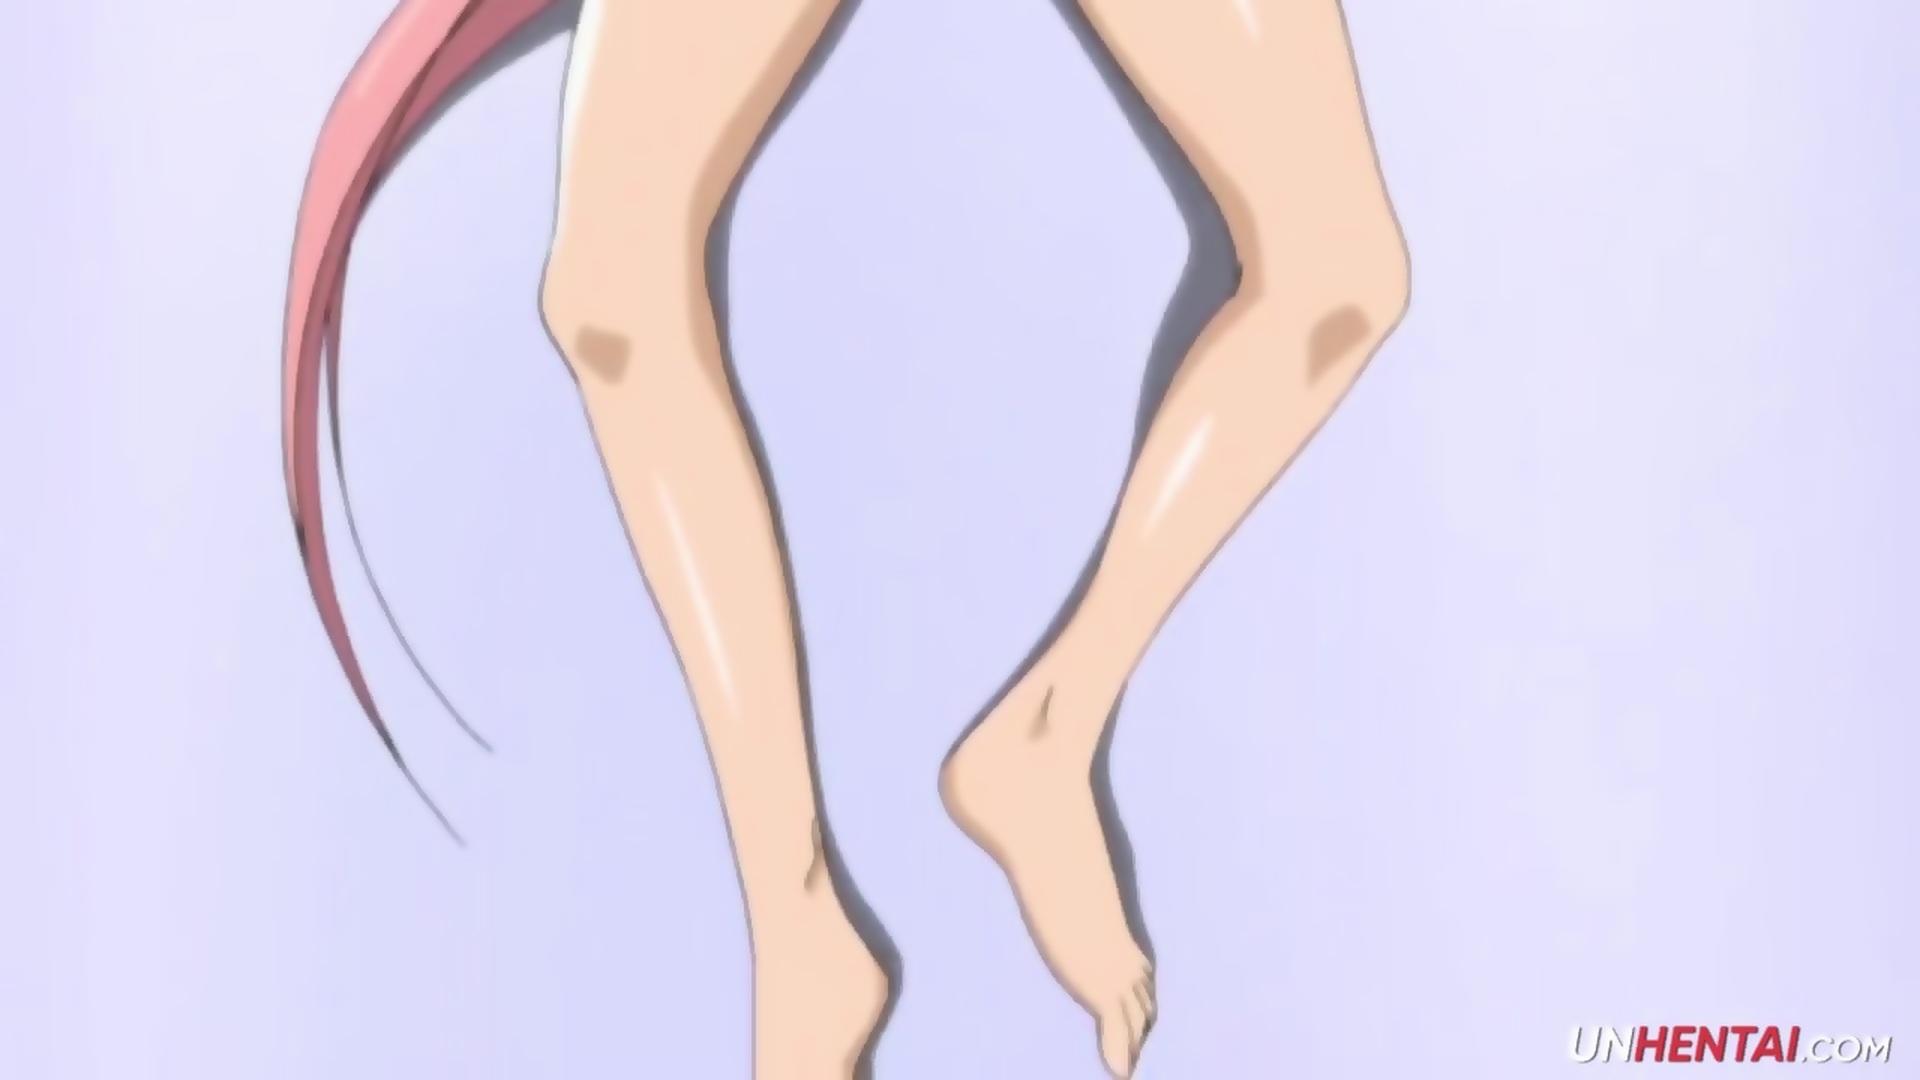 Big Tits Rough Sex Hentai